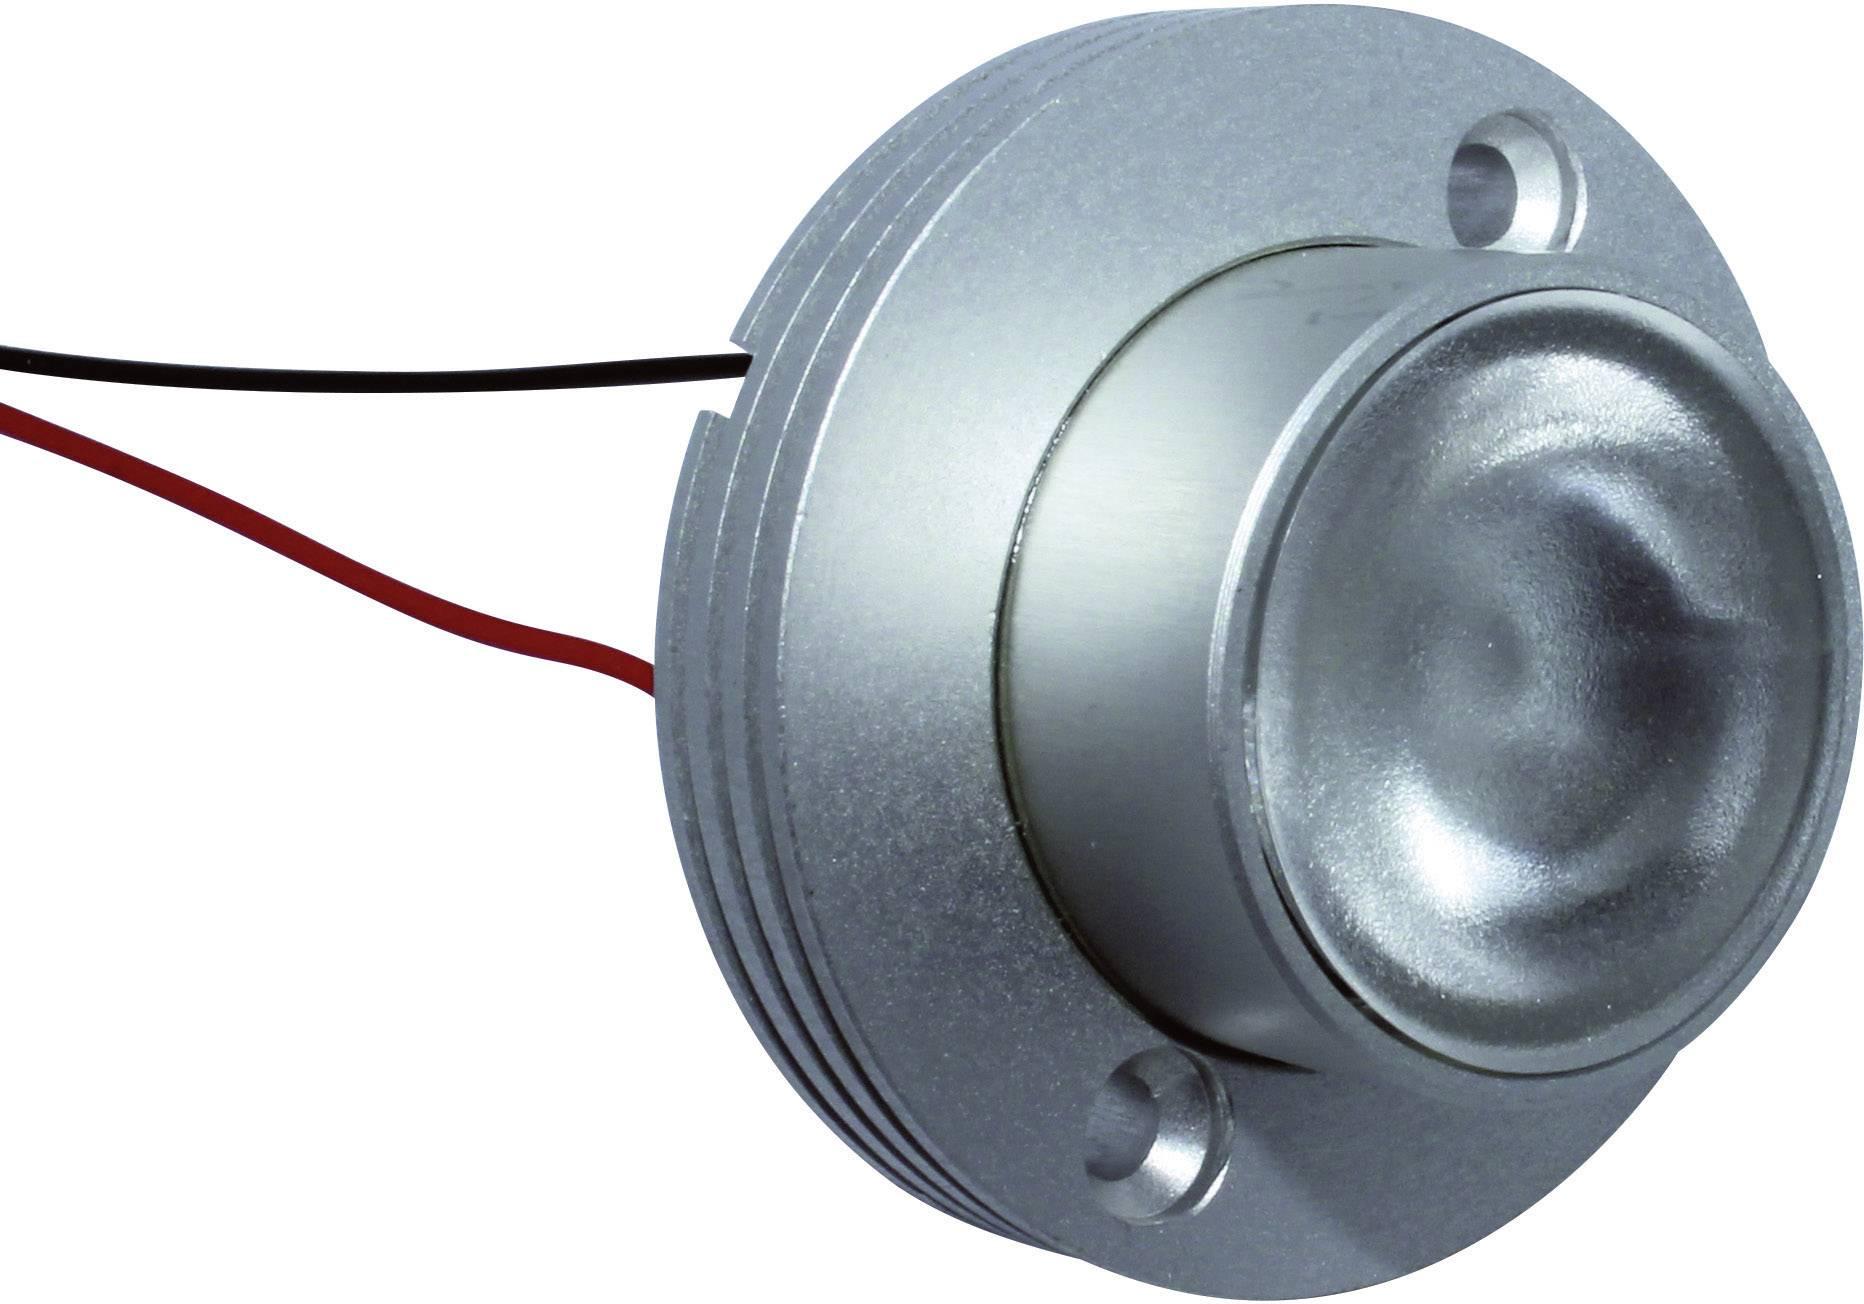 HighPower LED-spot Signal Construct QAUR1321L030, 30 °, 130 lm, 1 W, 3.6 V, zelená